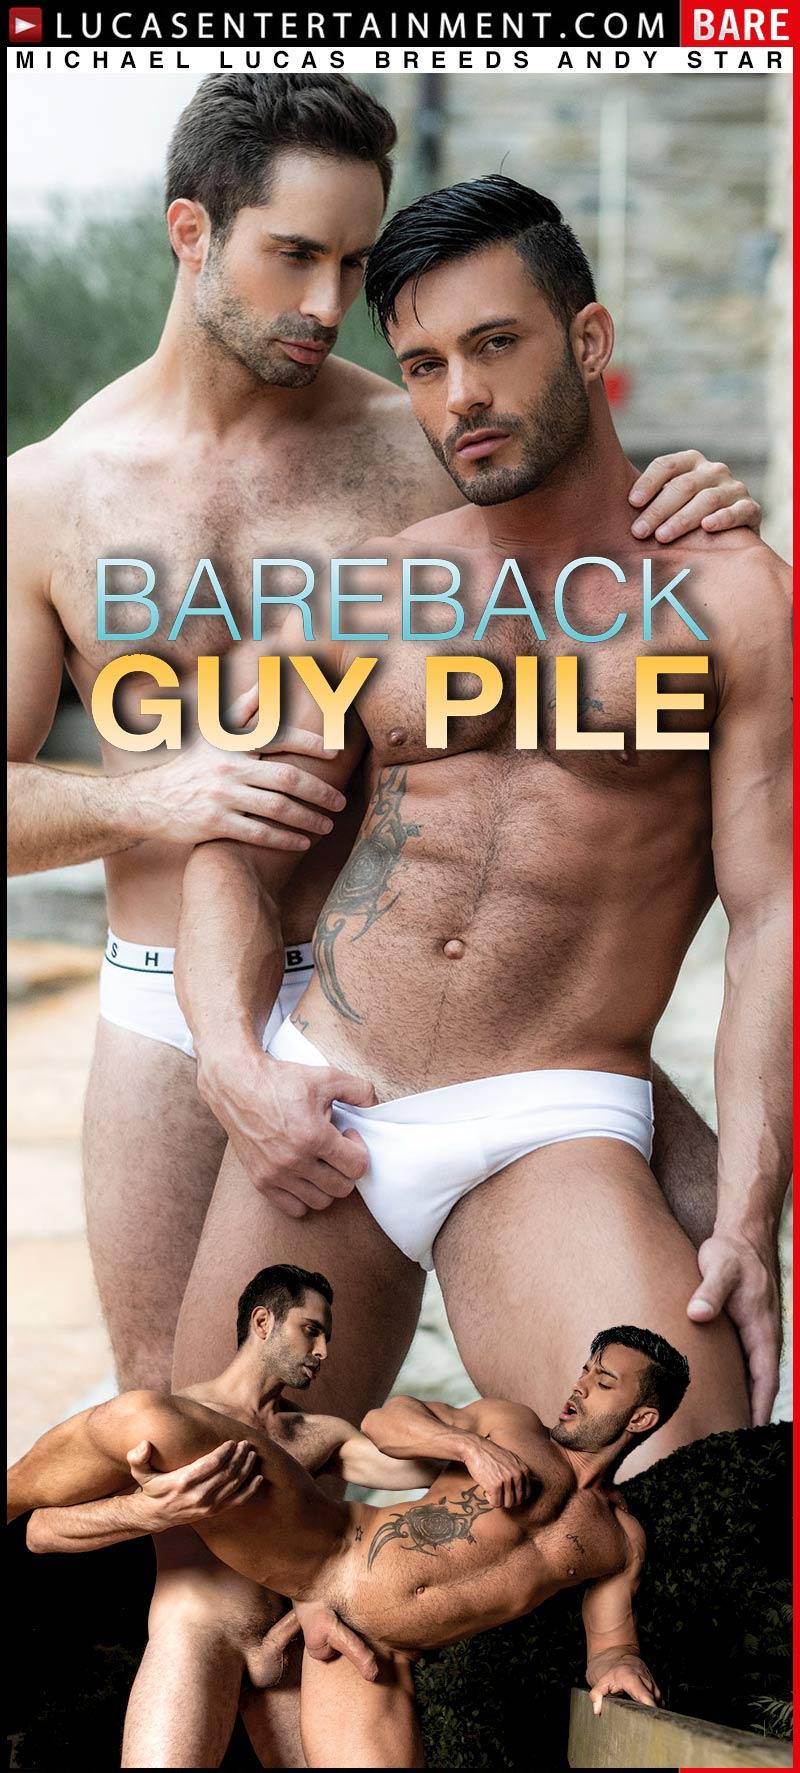 Bareback Guy Pile, Scene Two (Michael Lucas Fucks Andy Star) at Lucas Entertainment